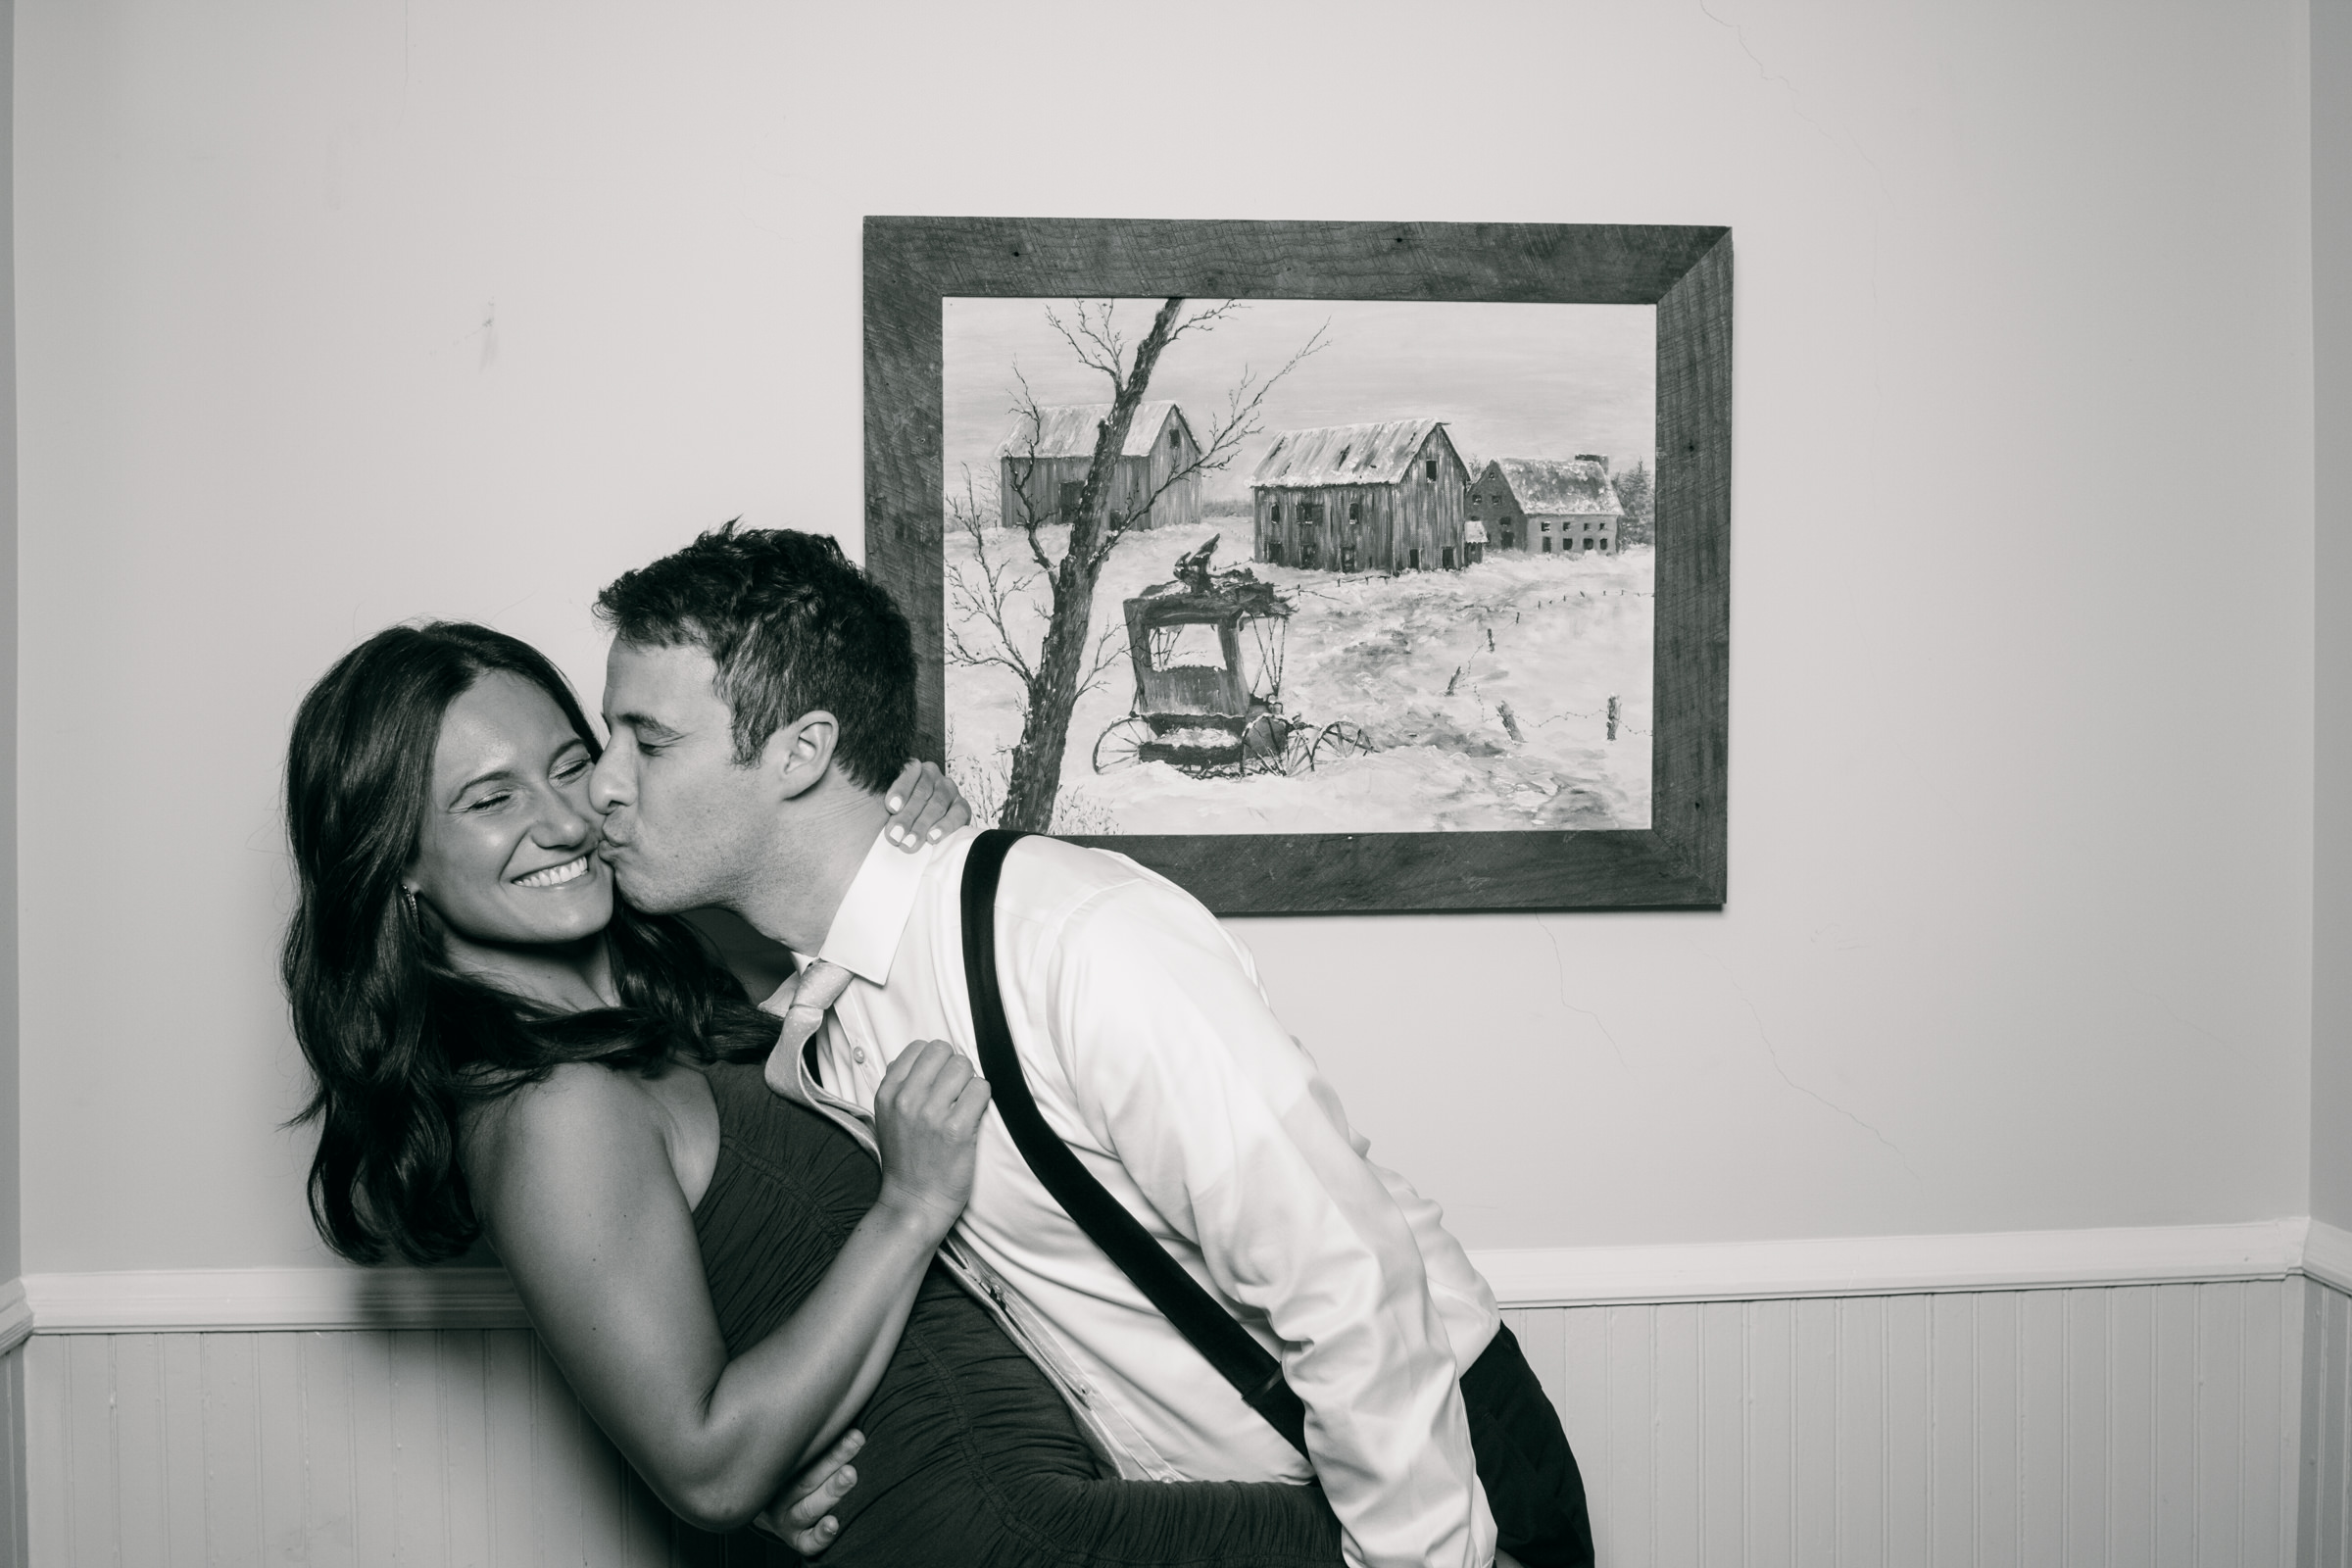 Nicole-Greg-Wedding-Photo-Booth-Lodge-Mountain-Springs-33.jpg